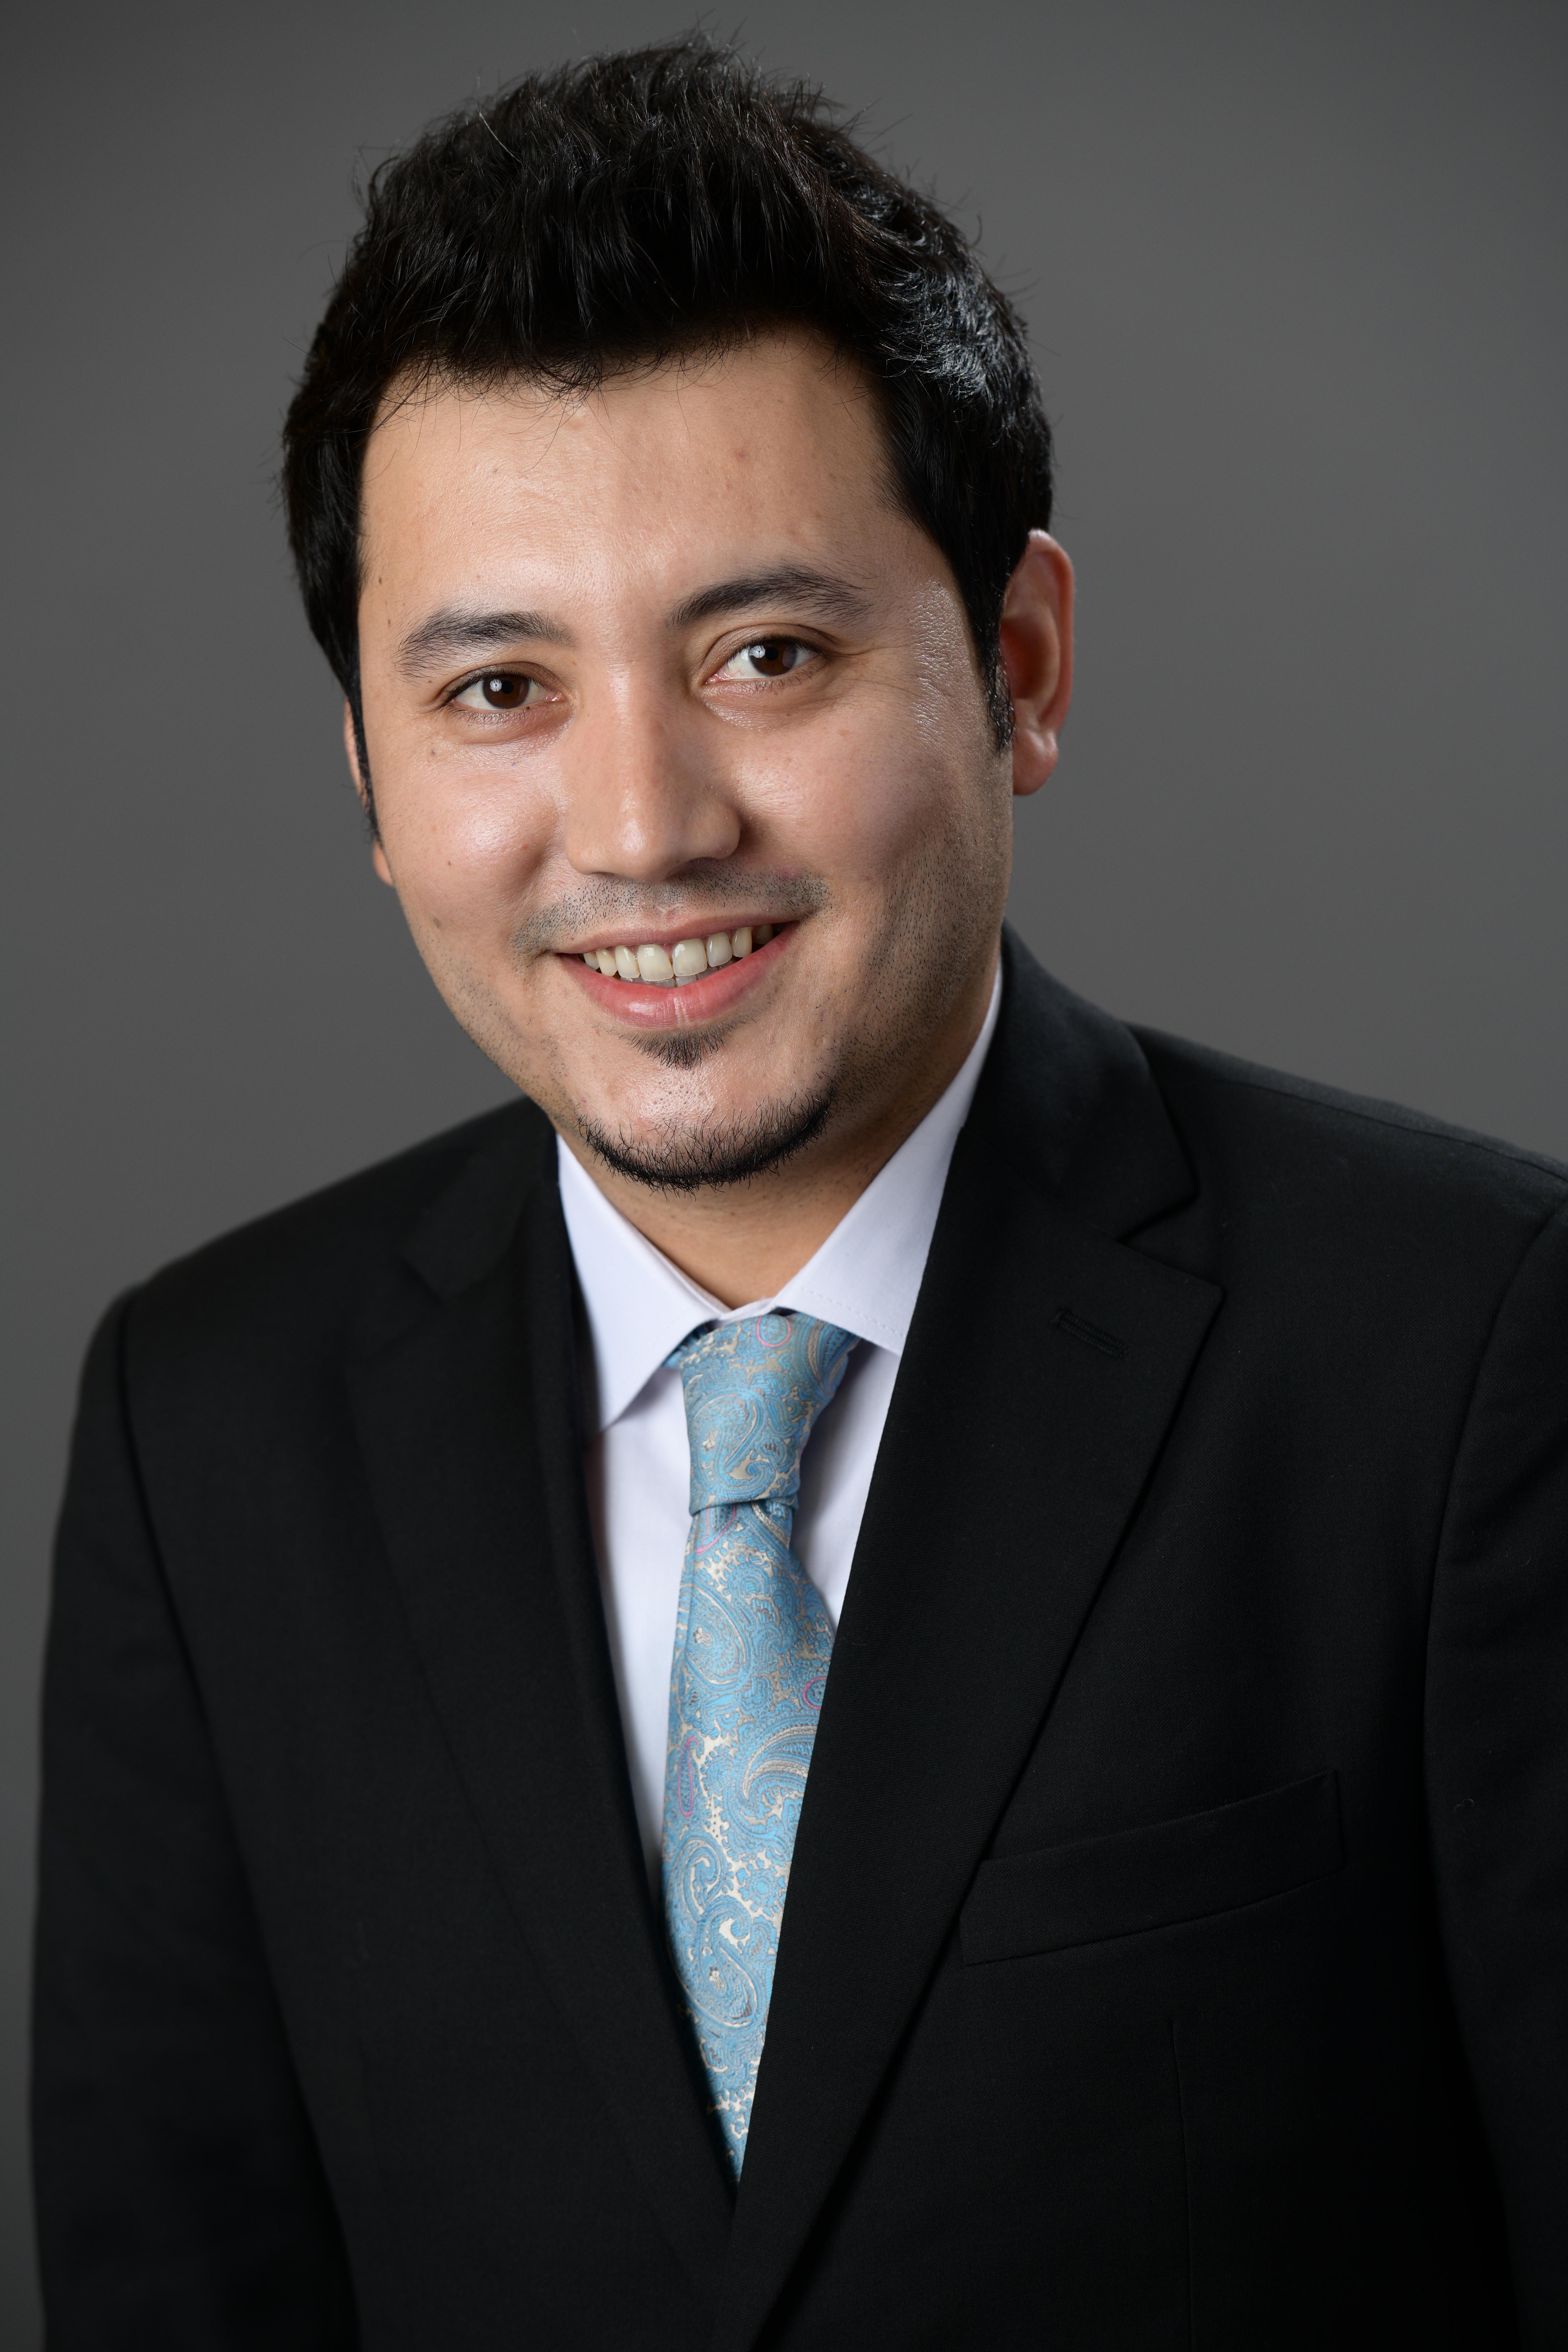 Shabir Eman, Headshot